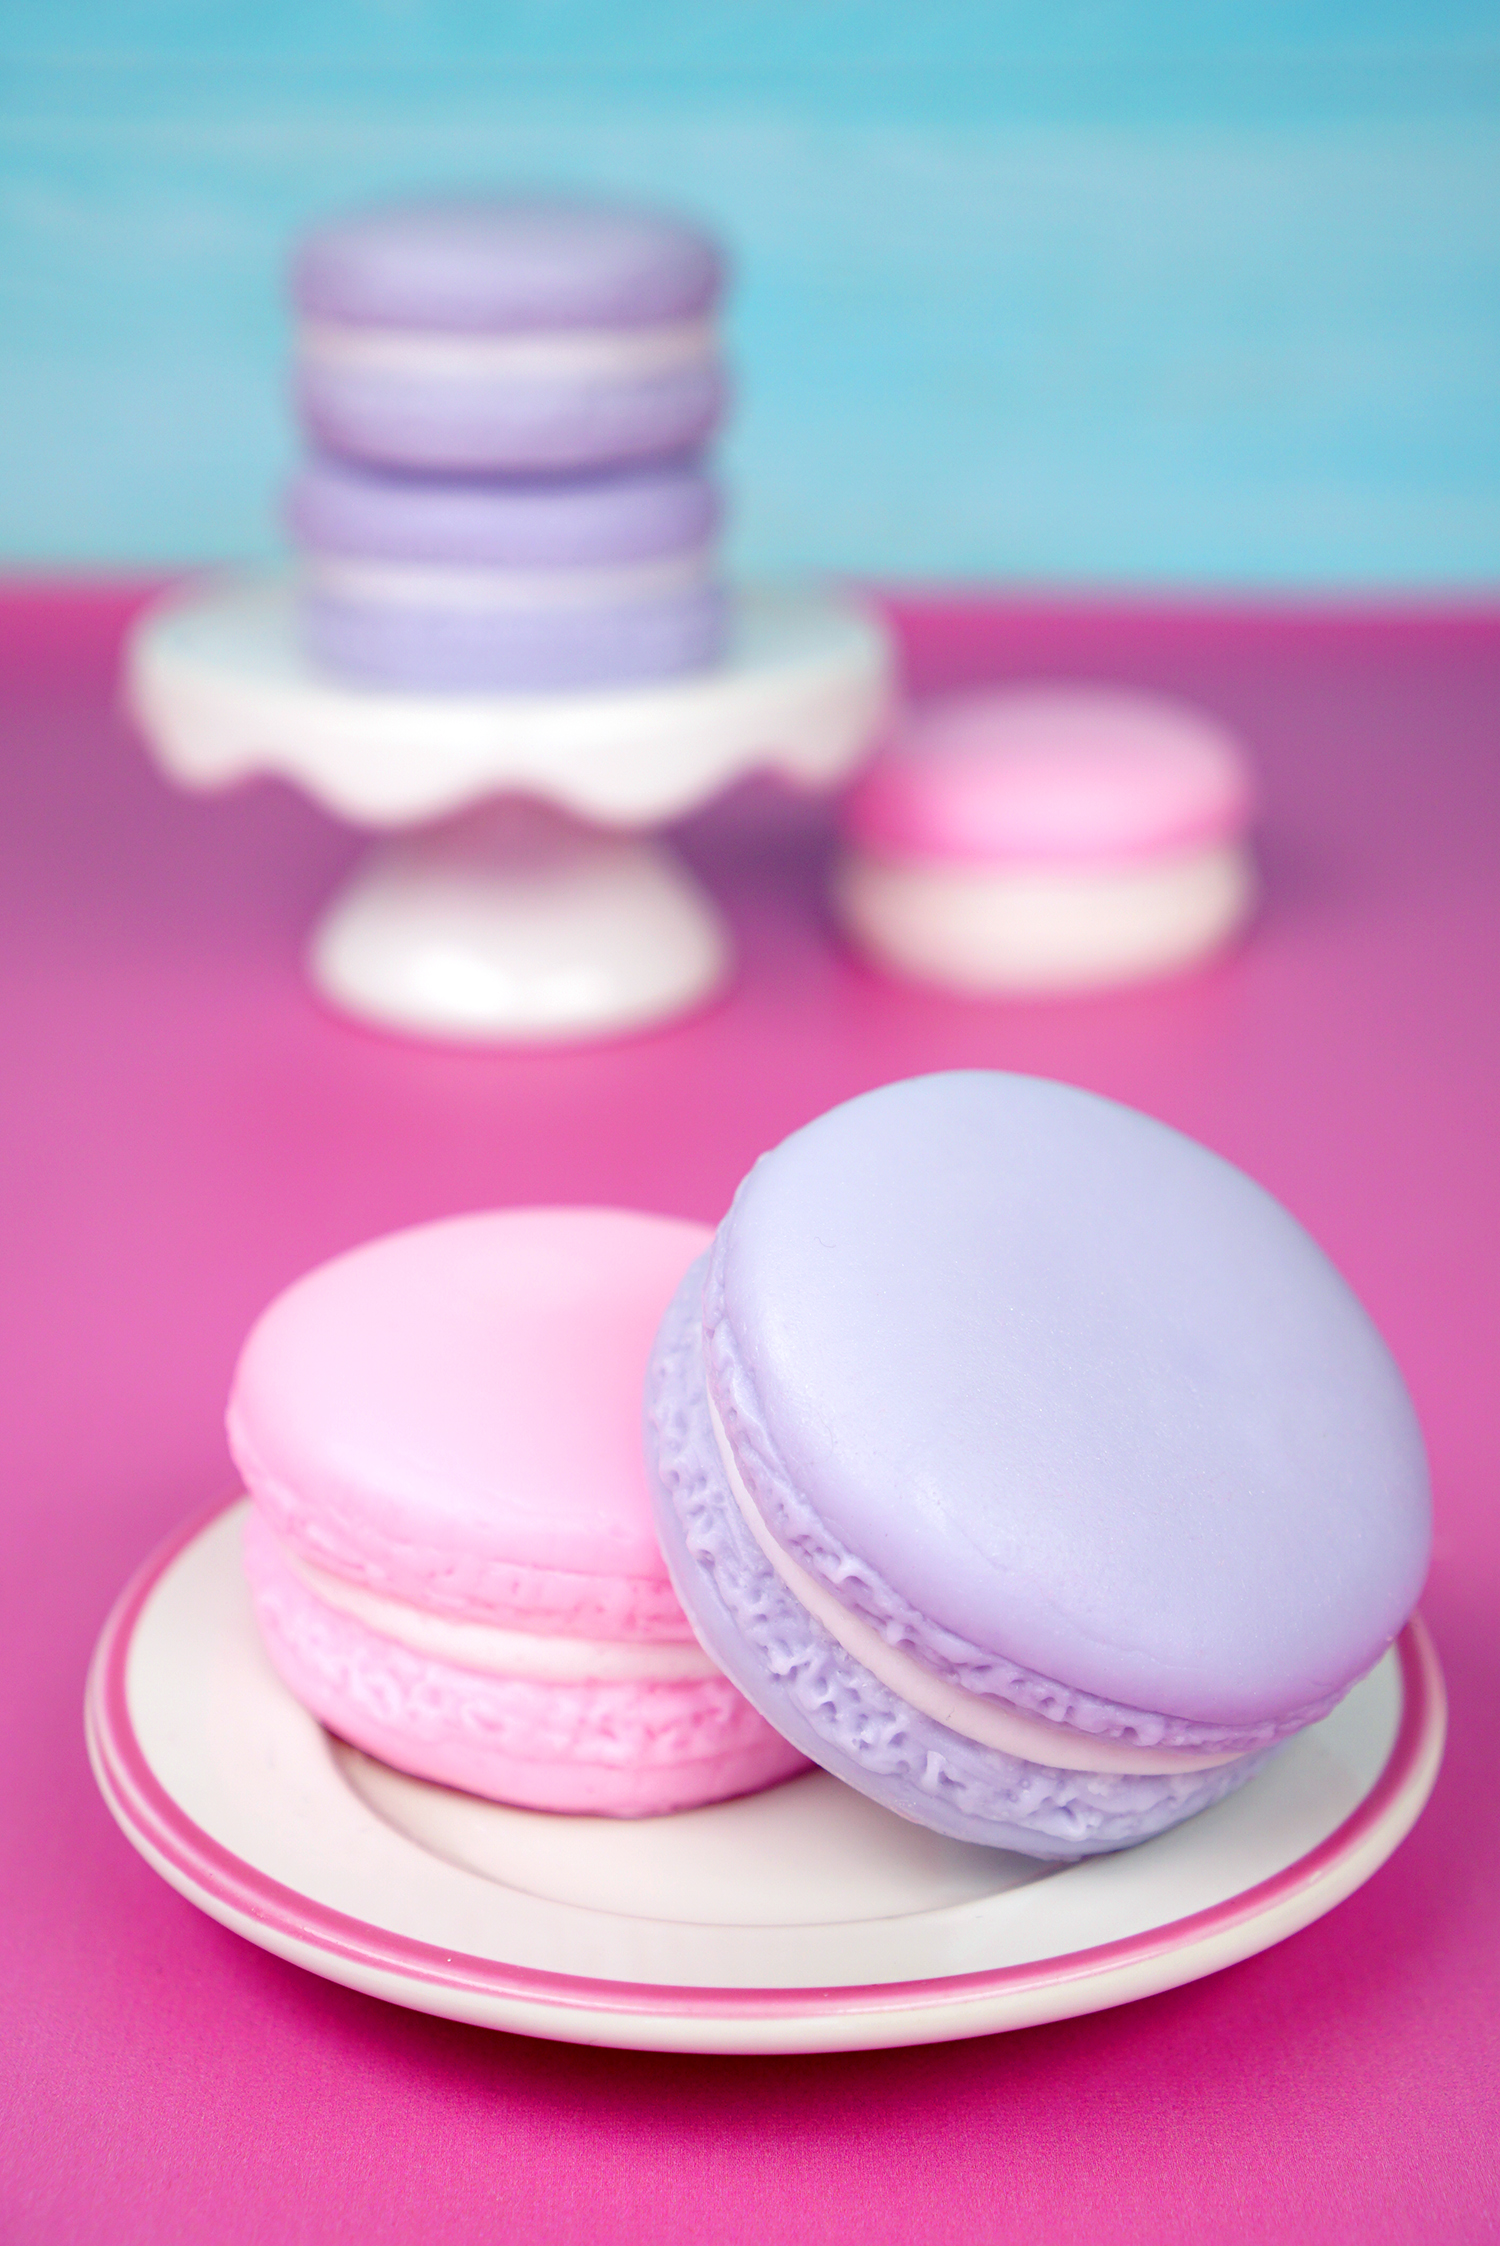 Bubblesoap Macaron Package Daftar Harga Penjualan Terbaik Terkini Kartu Bca Flazz Special Edisi Macaroon Terbaru Indonesia Source Soap Cookies Sweet Bubble These